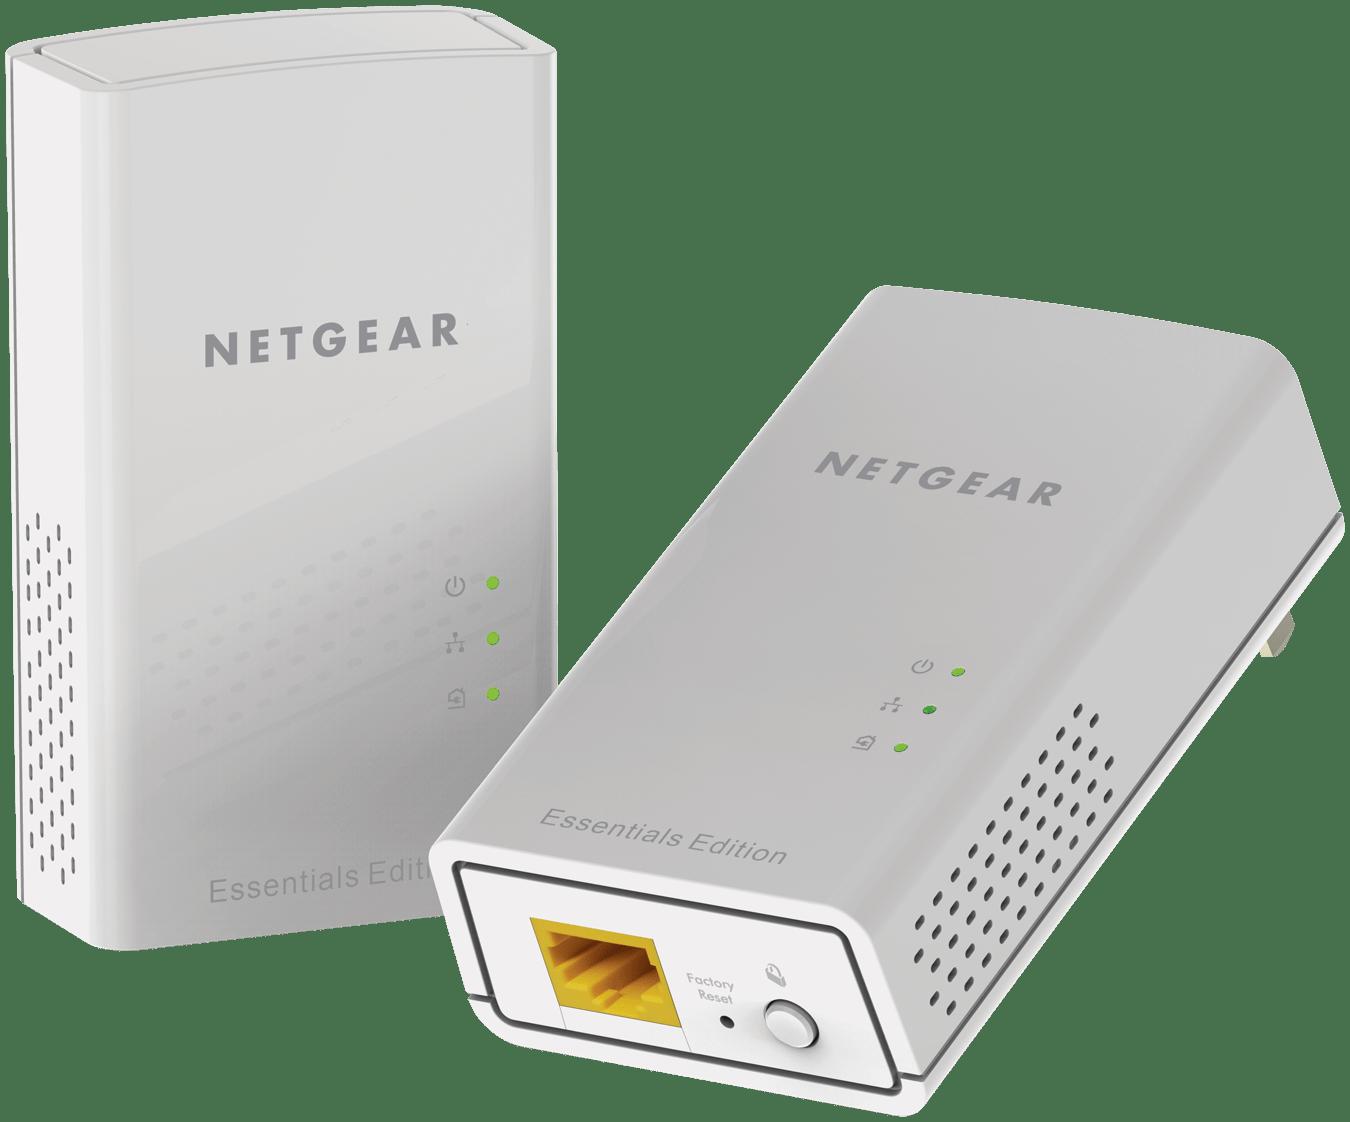 hight resolution of netgear wiring diagram